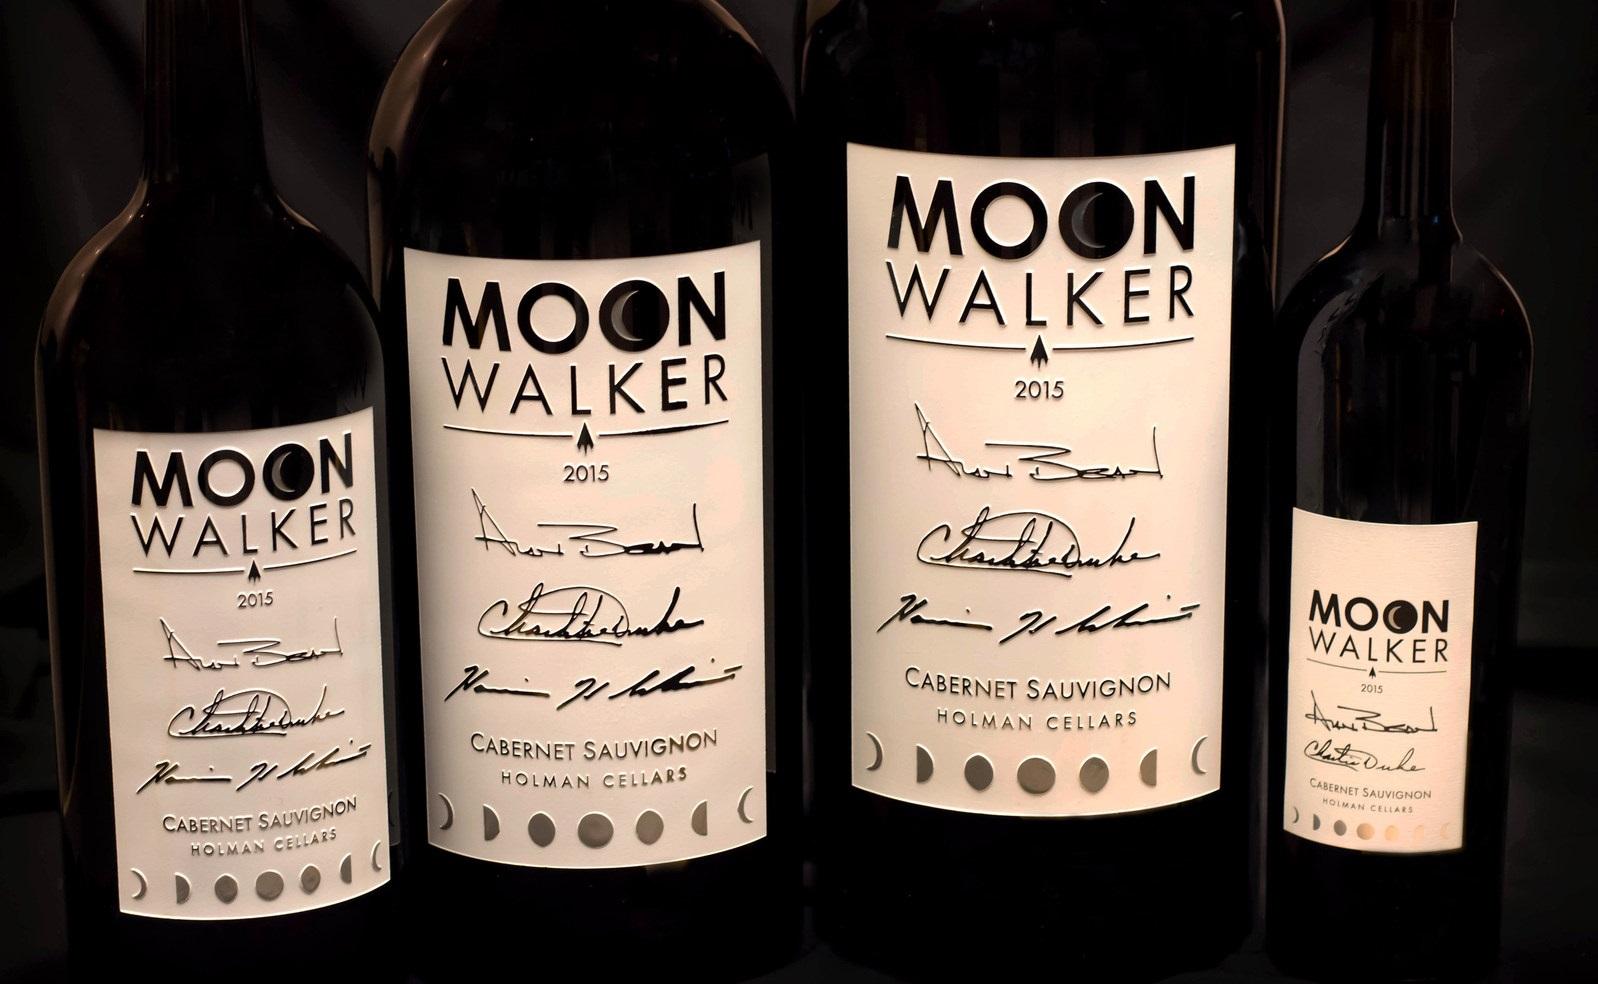 Special Valentine's Release From Moonwalker